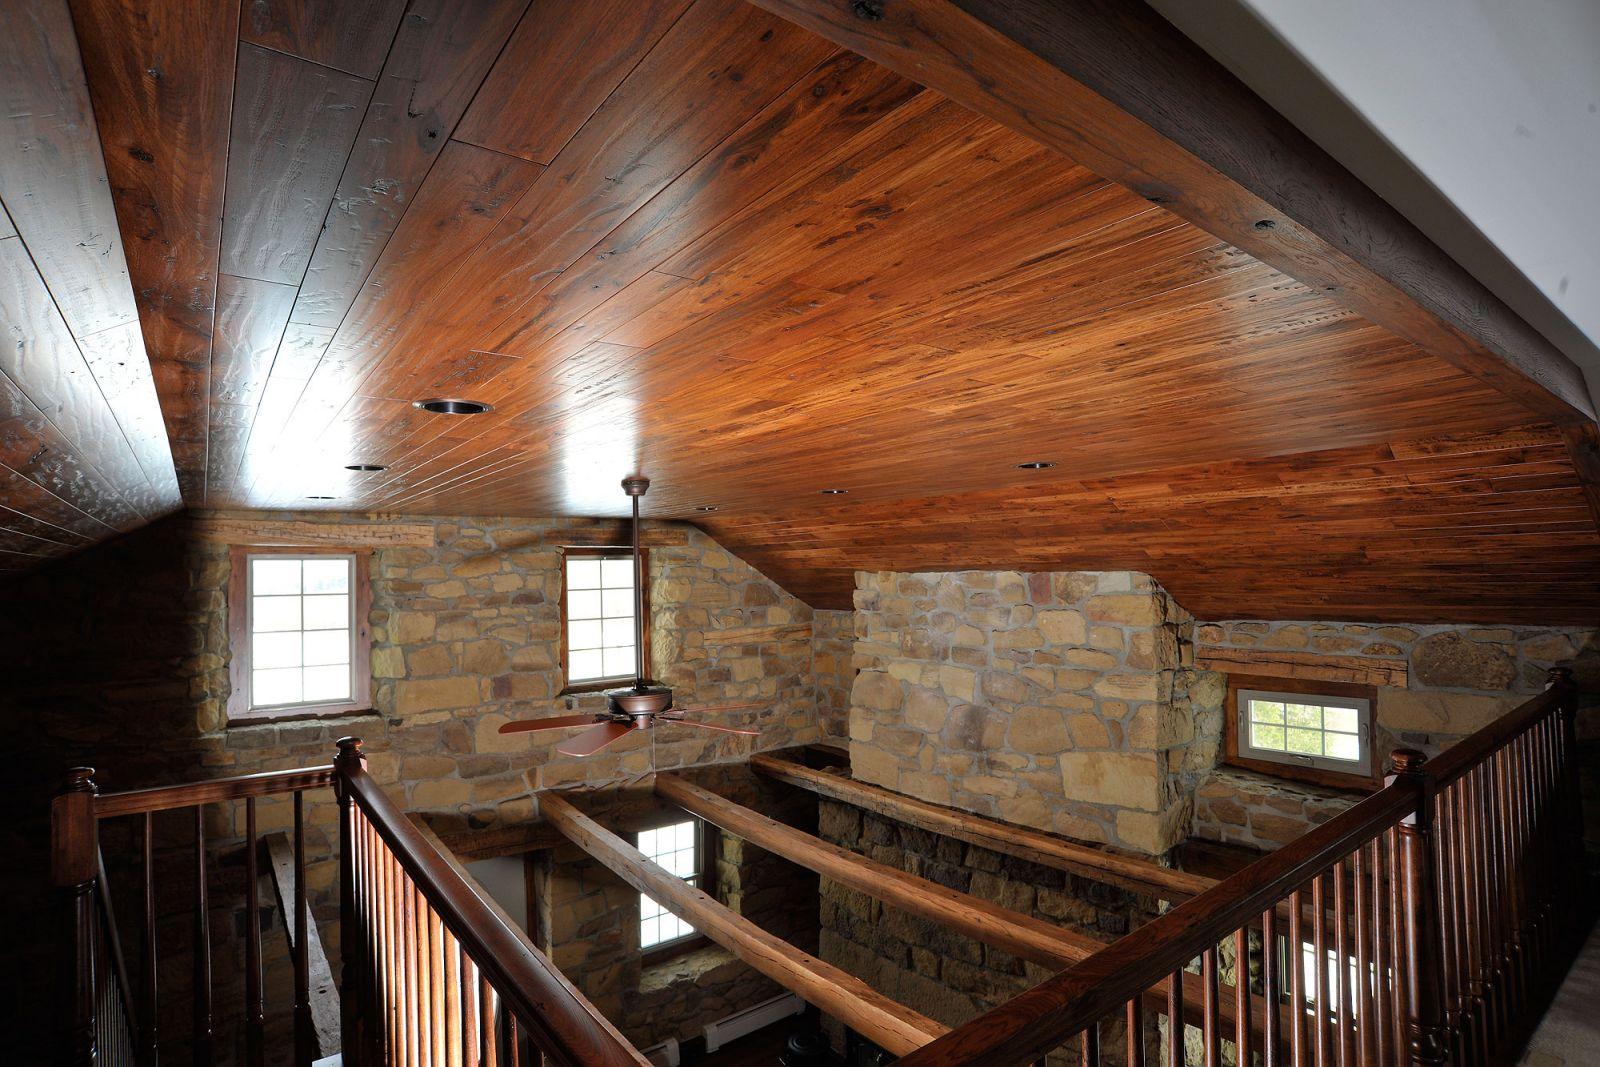 Mhp Flooring By Mount Hope Planing Flooring Gallery Wood